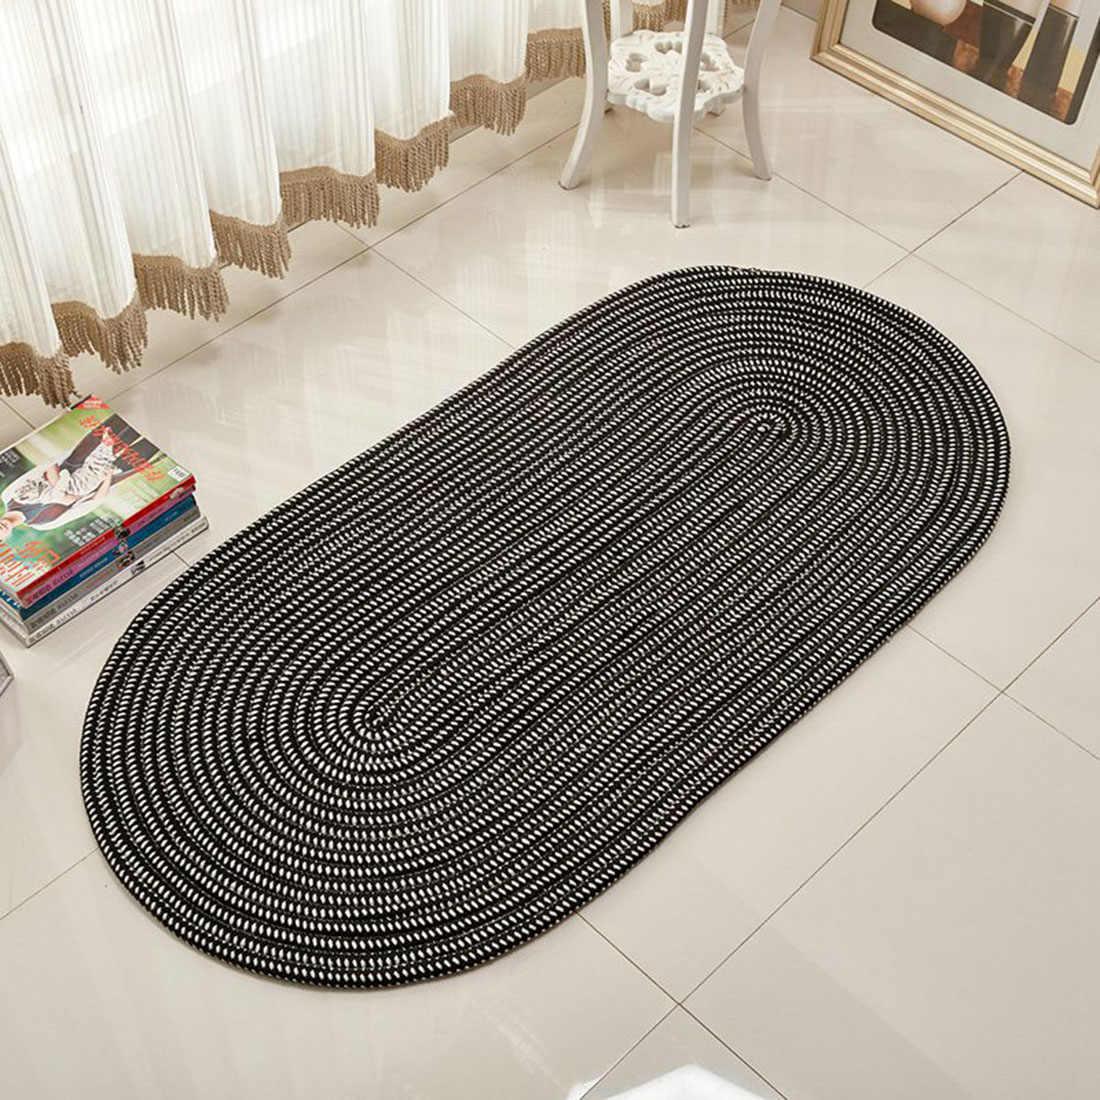 Hot Sales Oval Carpet Braided Area Rug Throw Rug For Living Room Bedroom Hallway Kitchen Washable Floor Mat Non Slip Doormat Rug Aliexpress